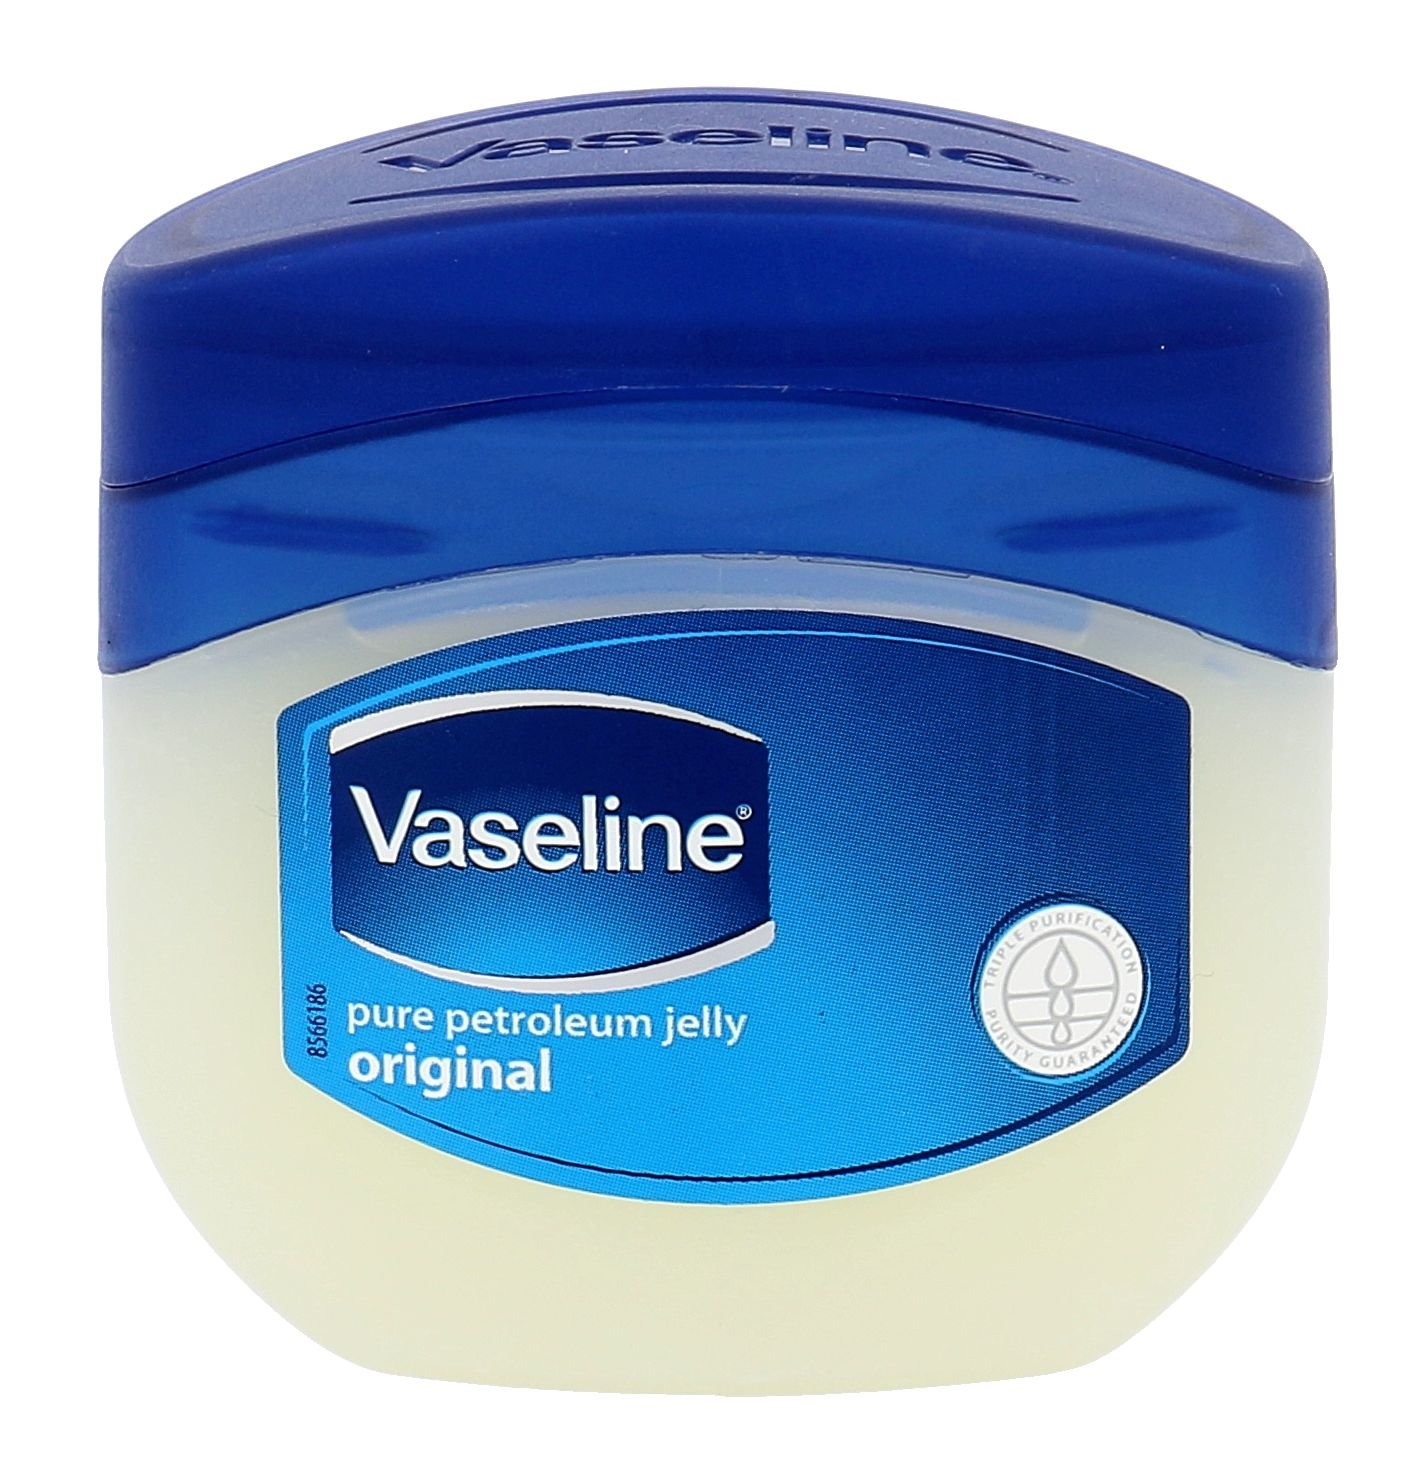 Vaseline Petroleum Jelly Original Cosmetic 50ml